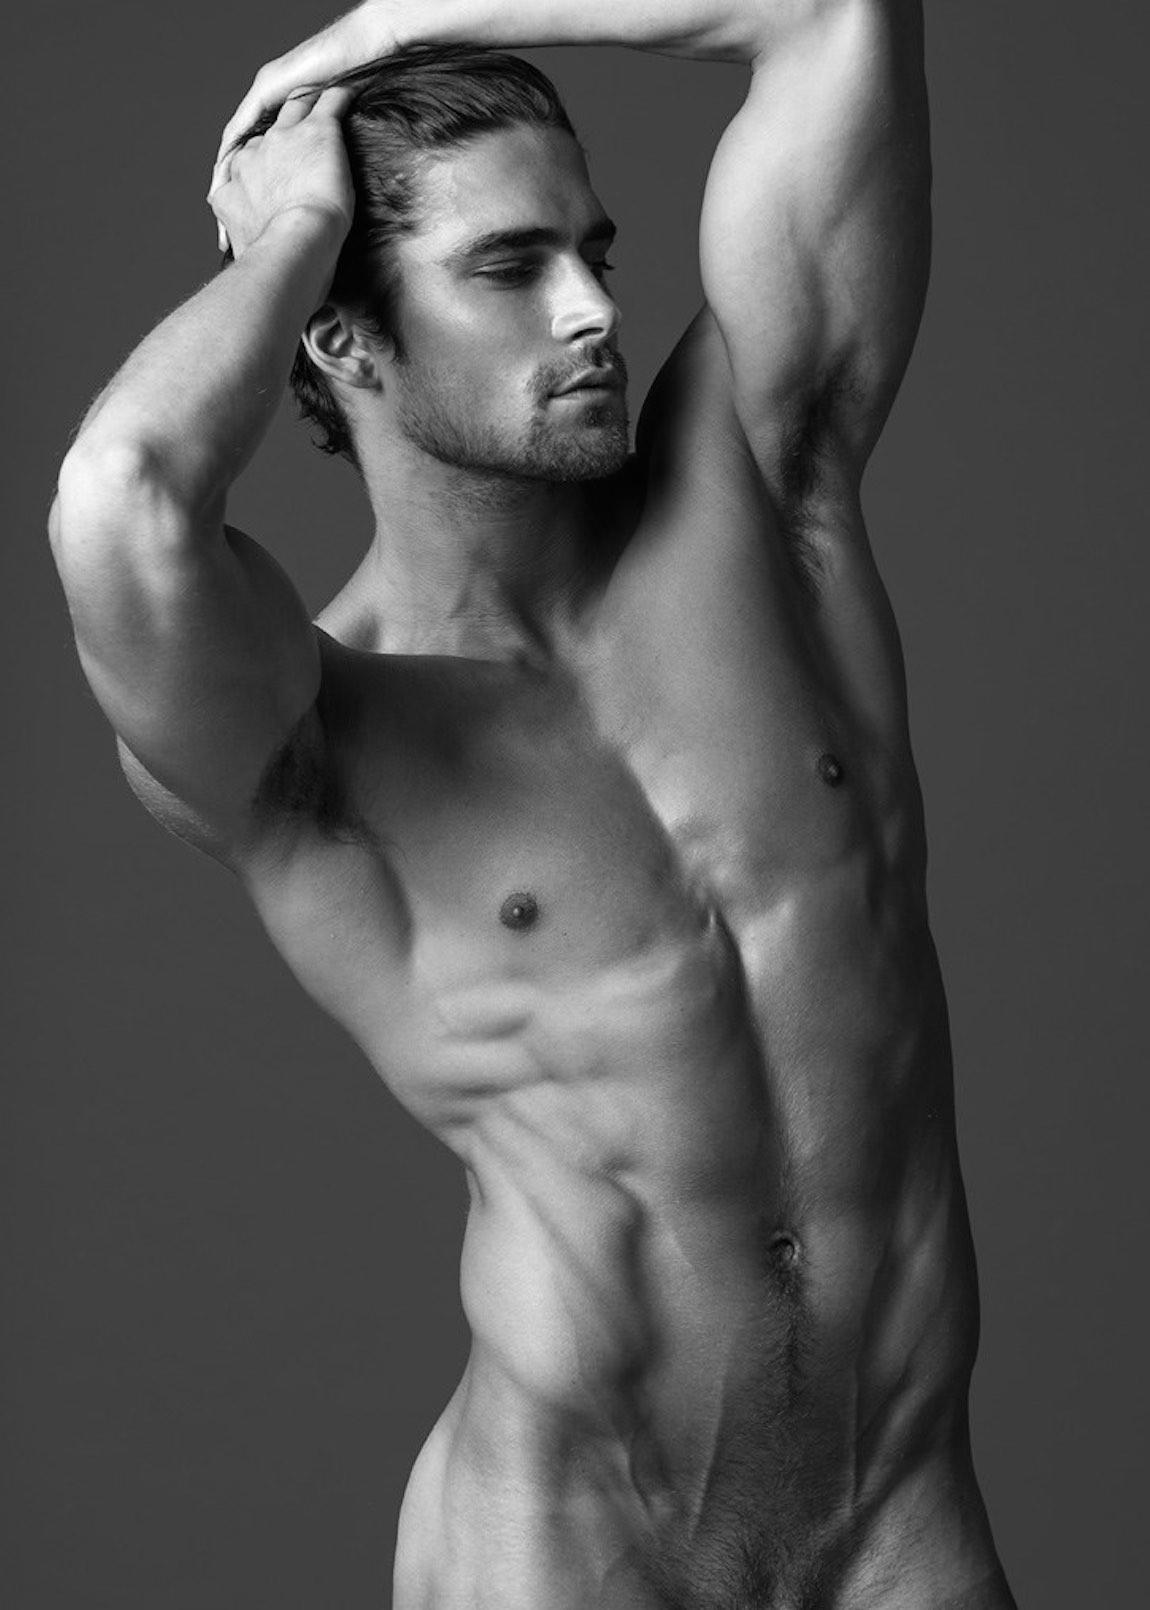 Alex Pettyfer con el torso desnudo junto a Matthew